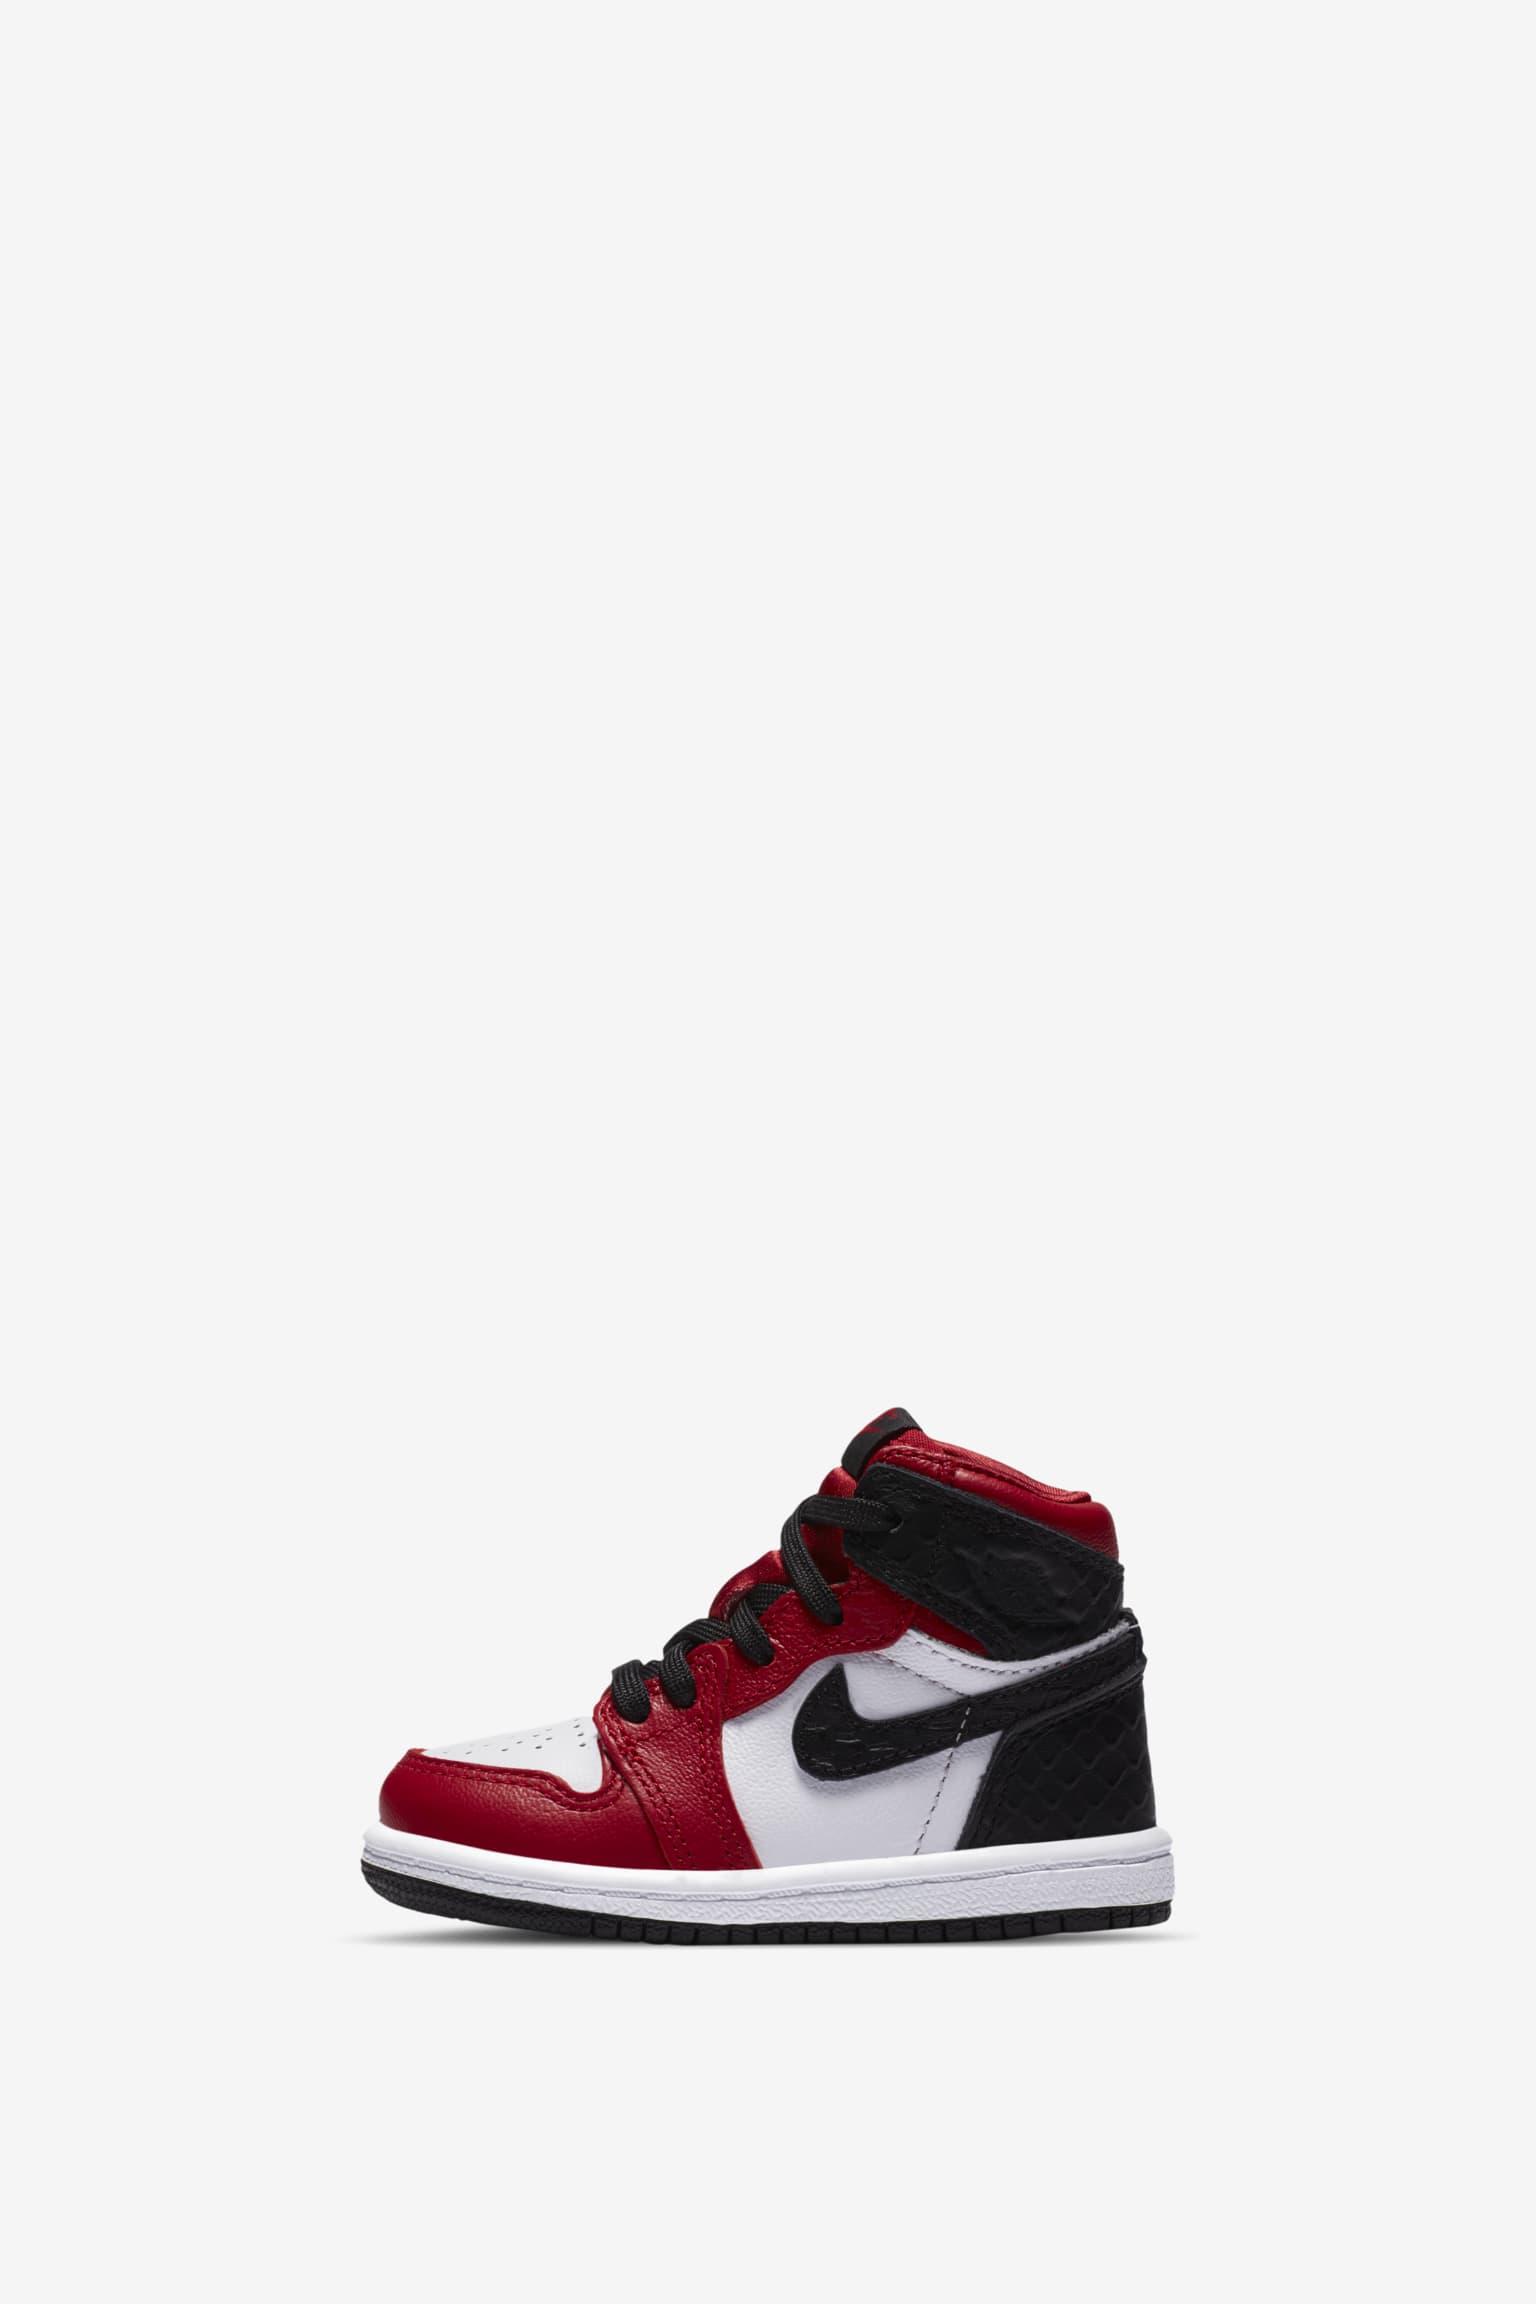 Women S Air Jordan 1 High Og Satin Red Title Snkrs Au Au